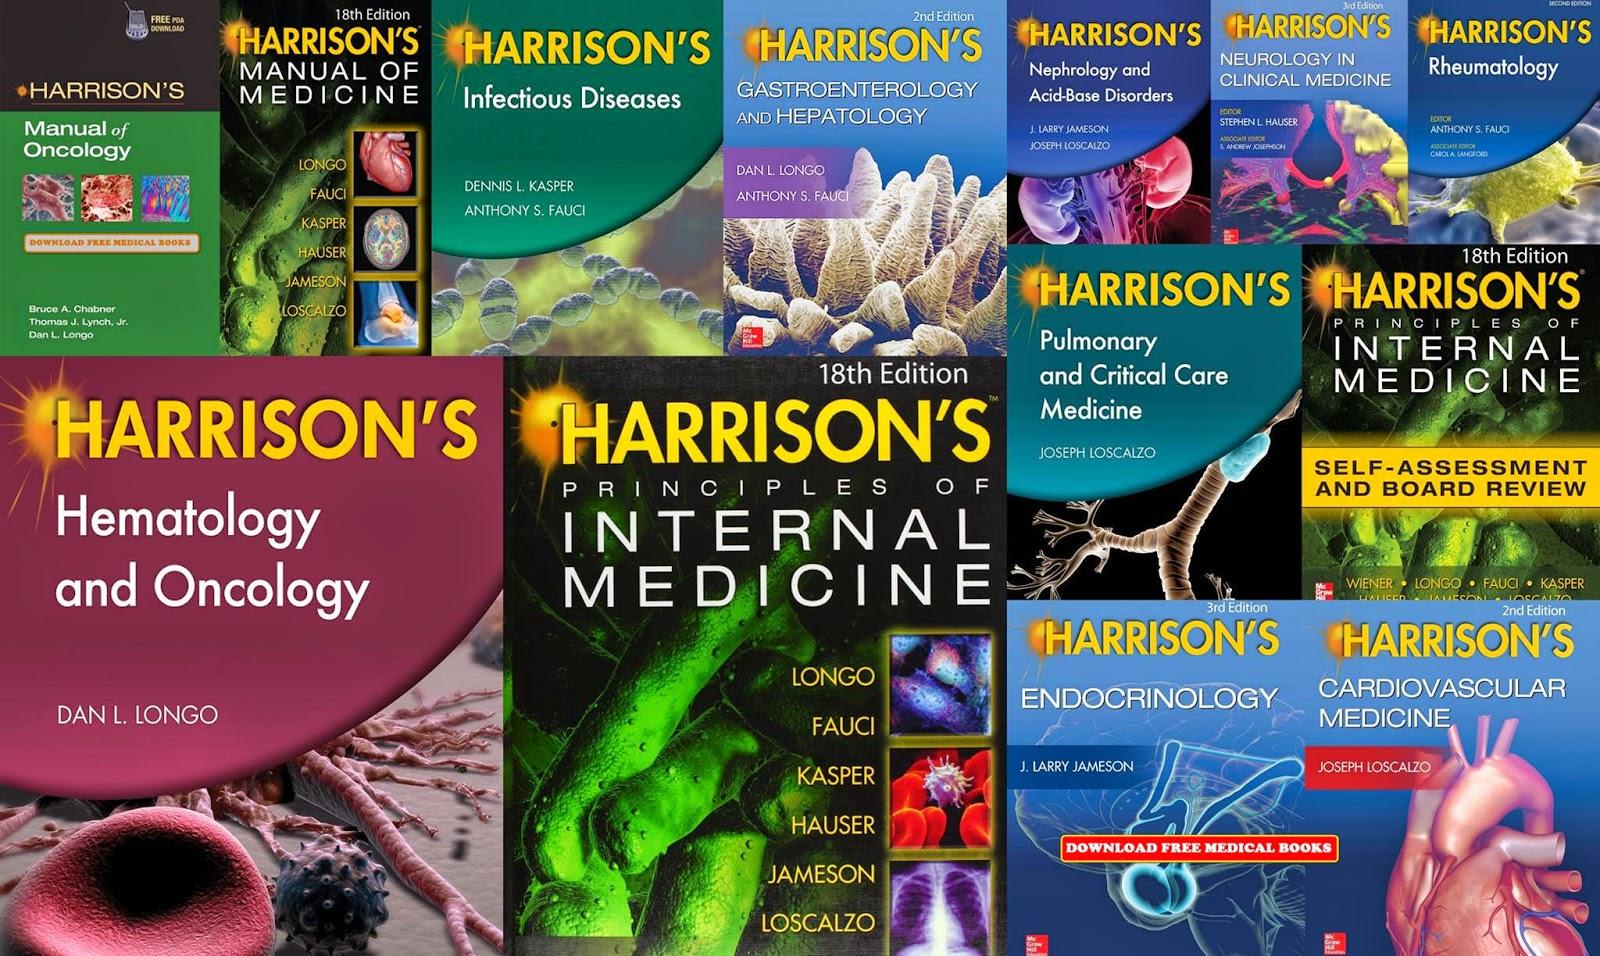 Harrison series (Harrison Books) - Ebooks Medical